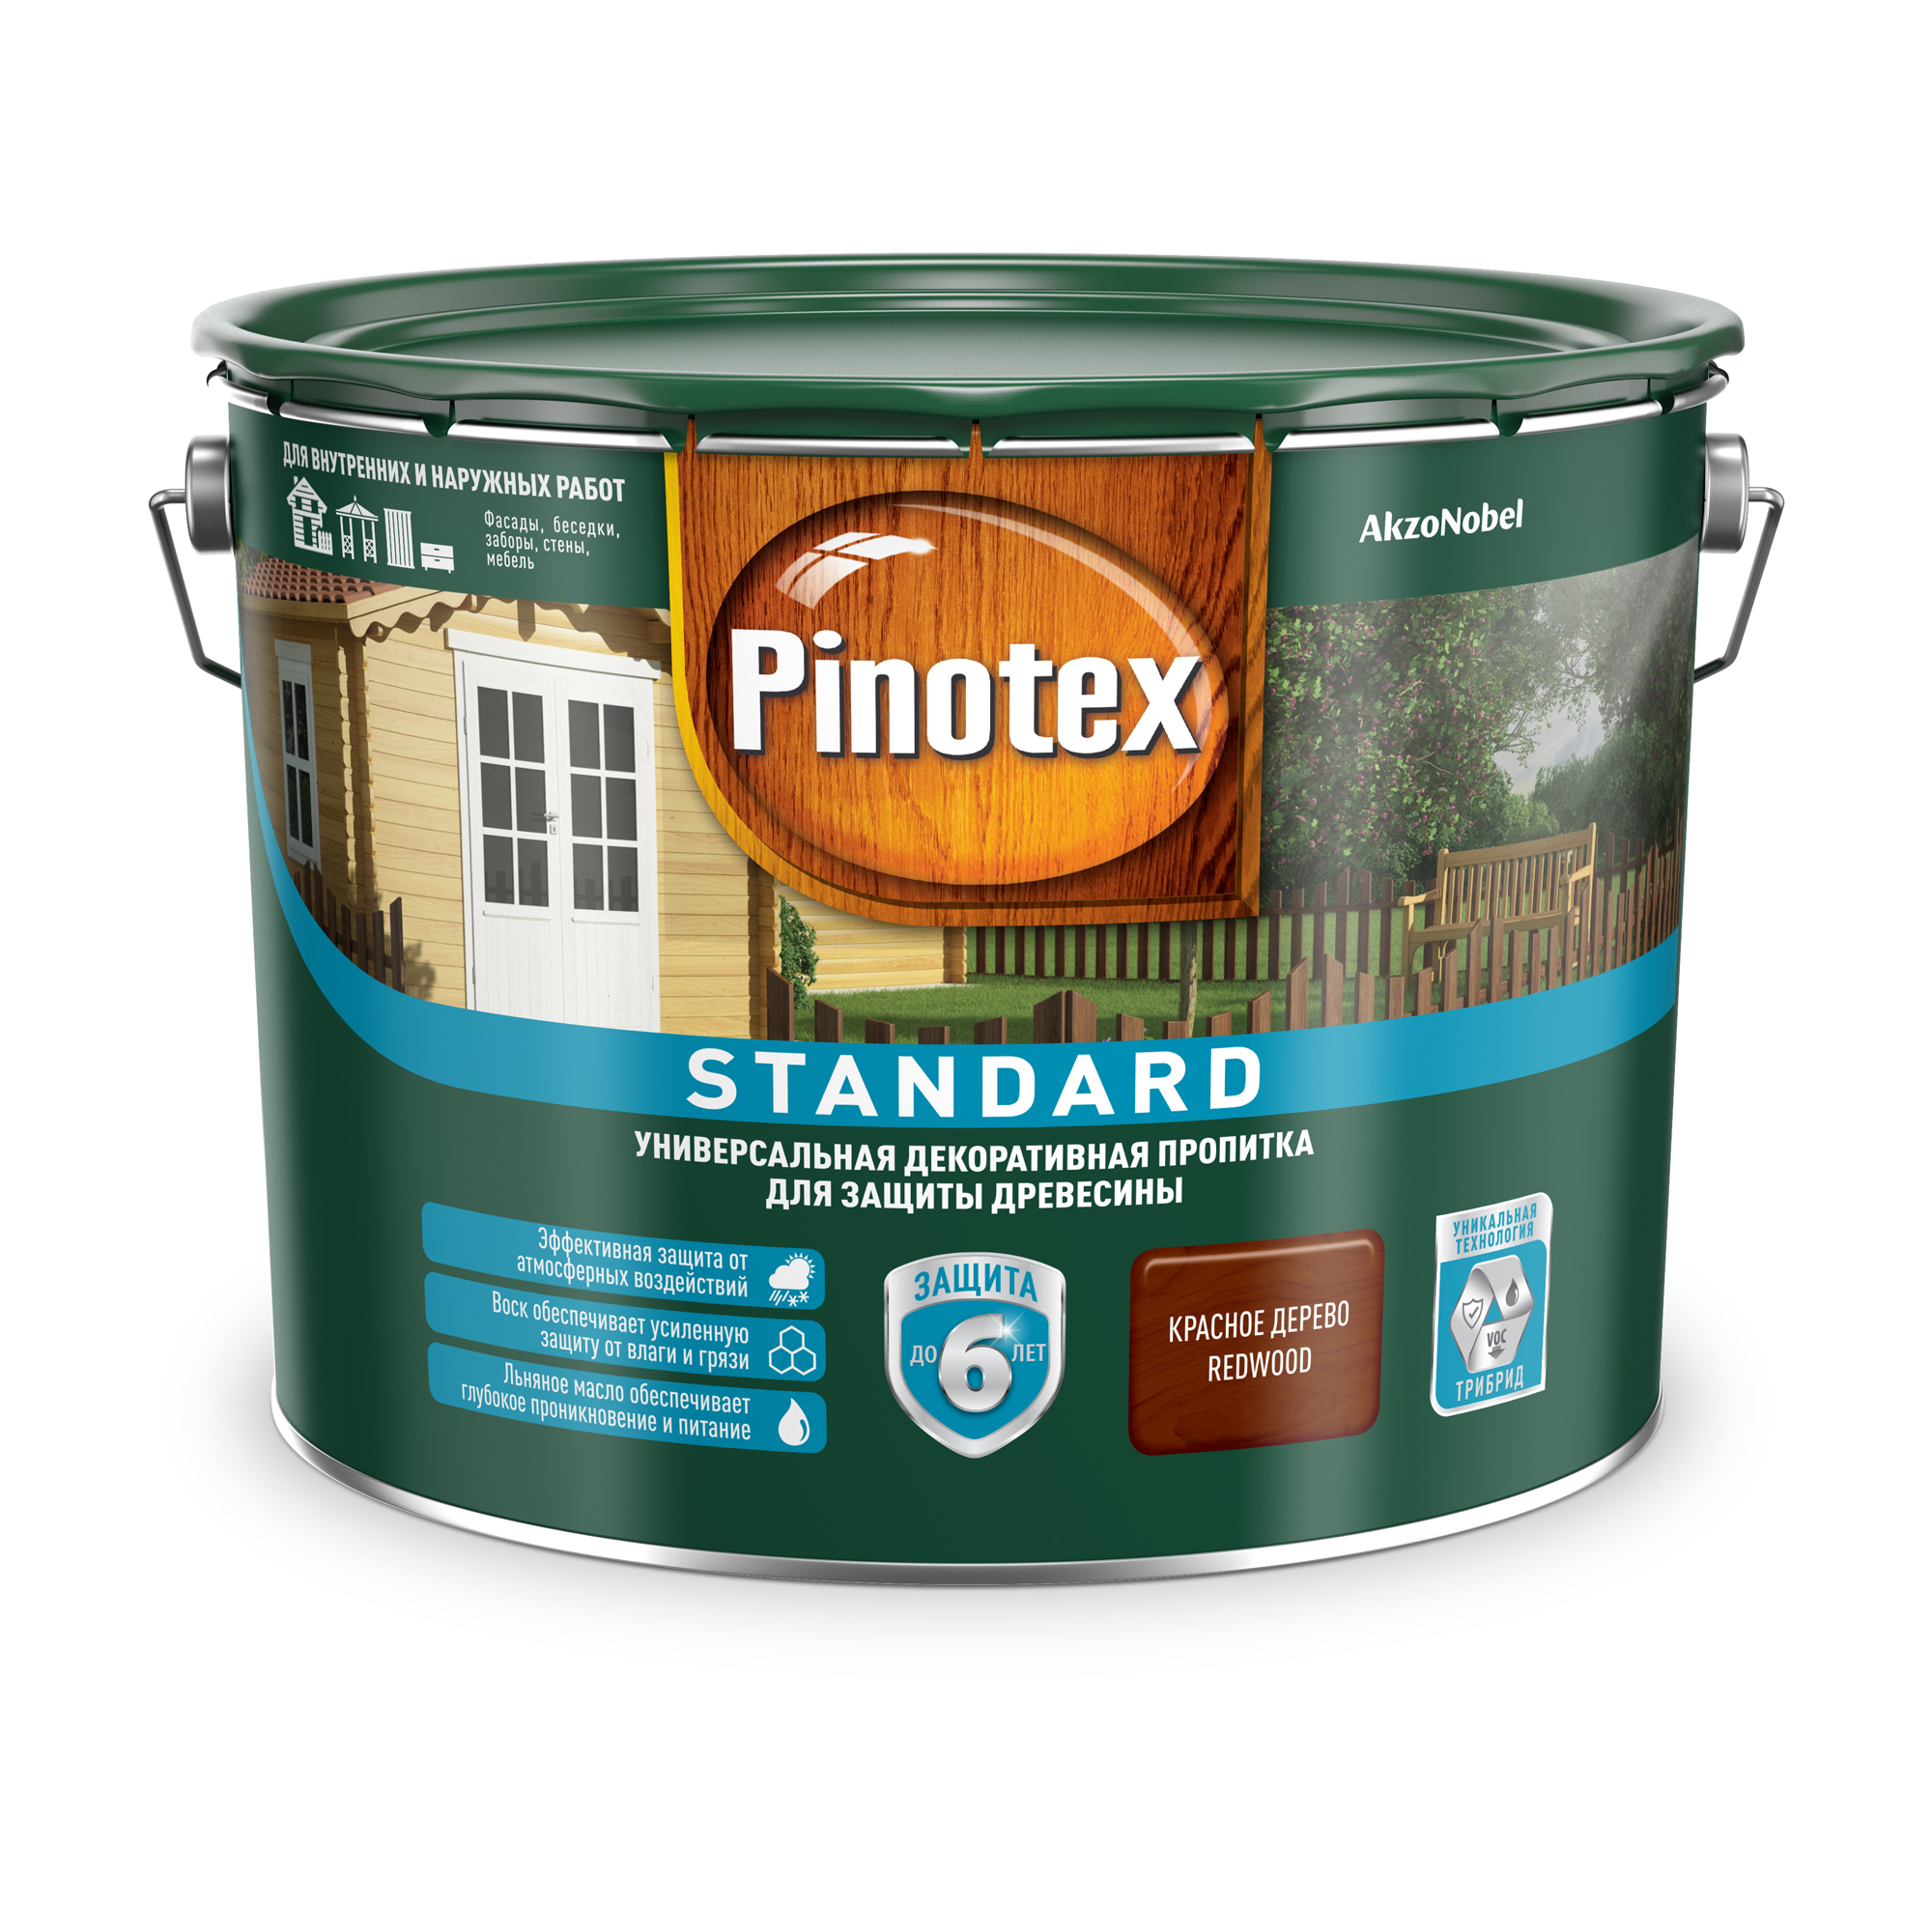 Пропитка Pinotex стандарт 9л красное дерево пропитка pinotex ультра 9л07 красное дерево